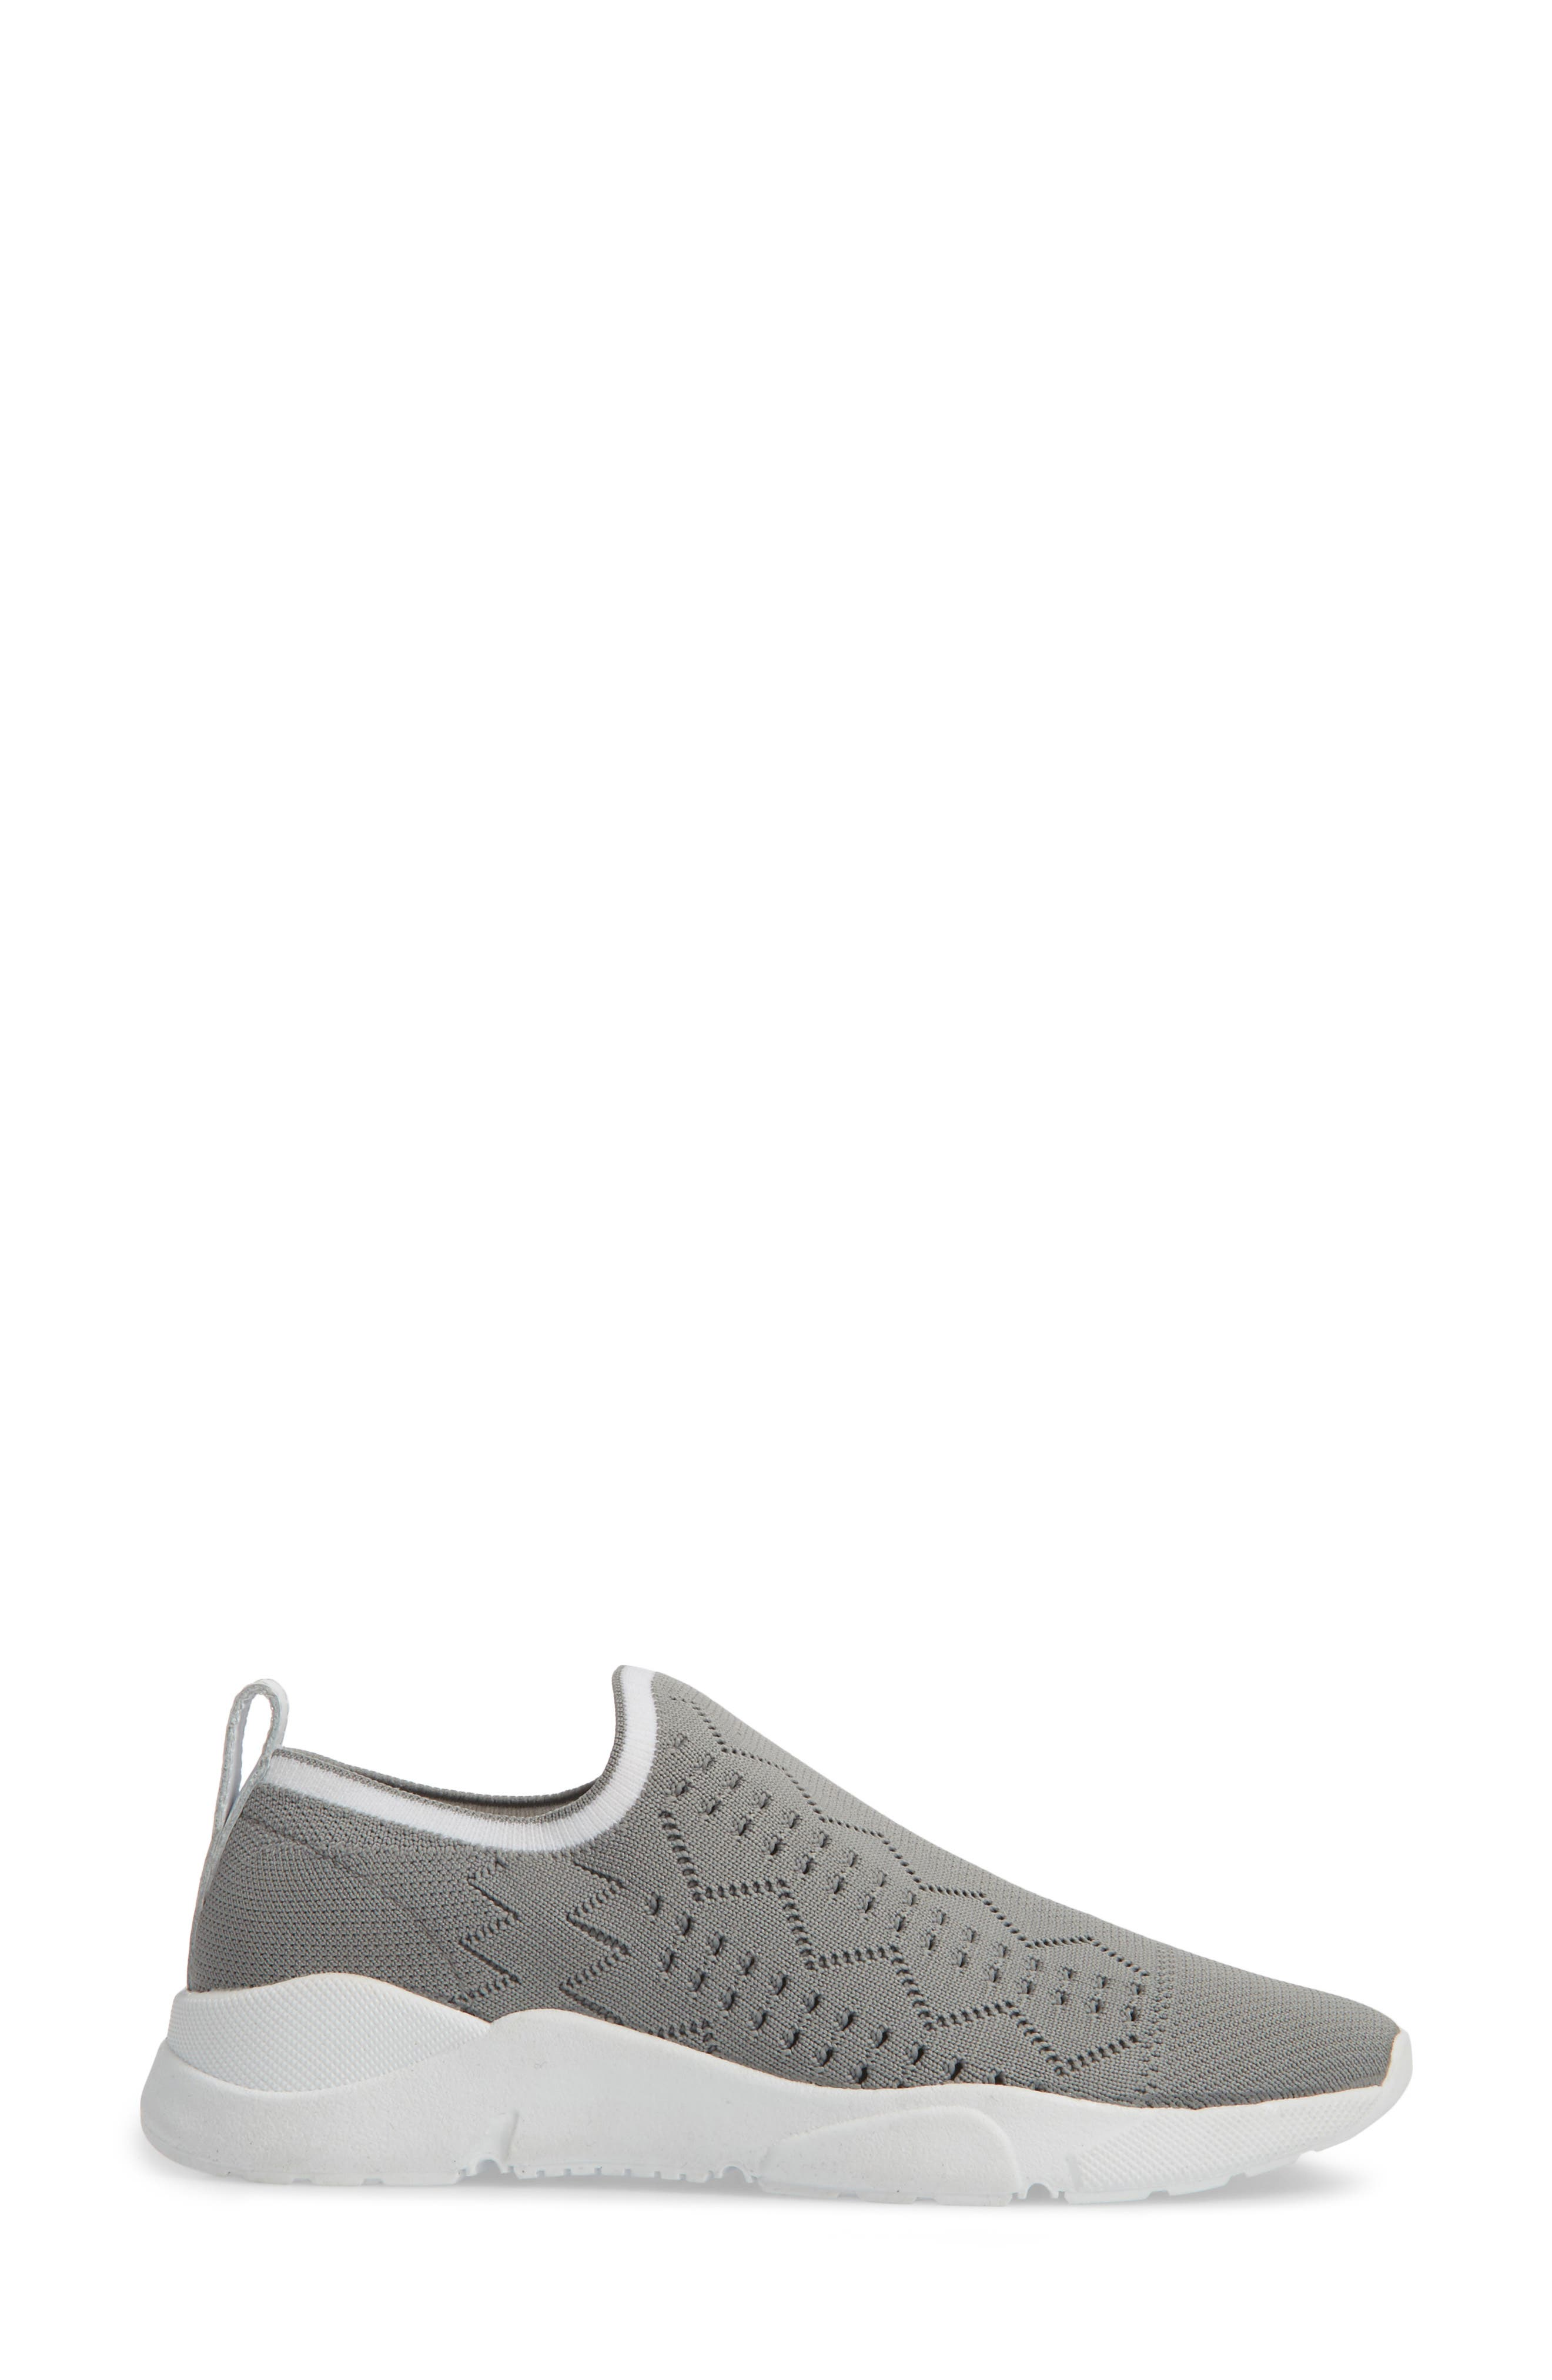 Karrie Slip-On Sneaker,                             Alternate thumbnail 3, color,                             Grey Stretch Fabric